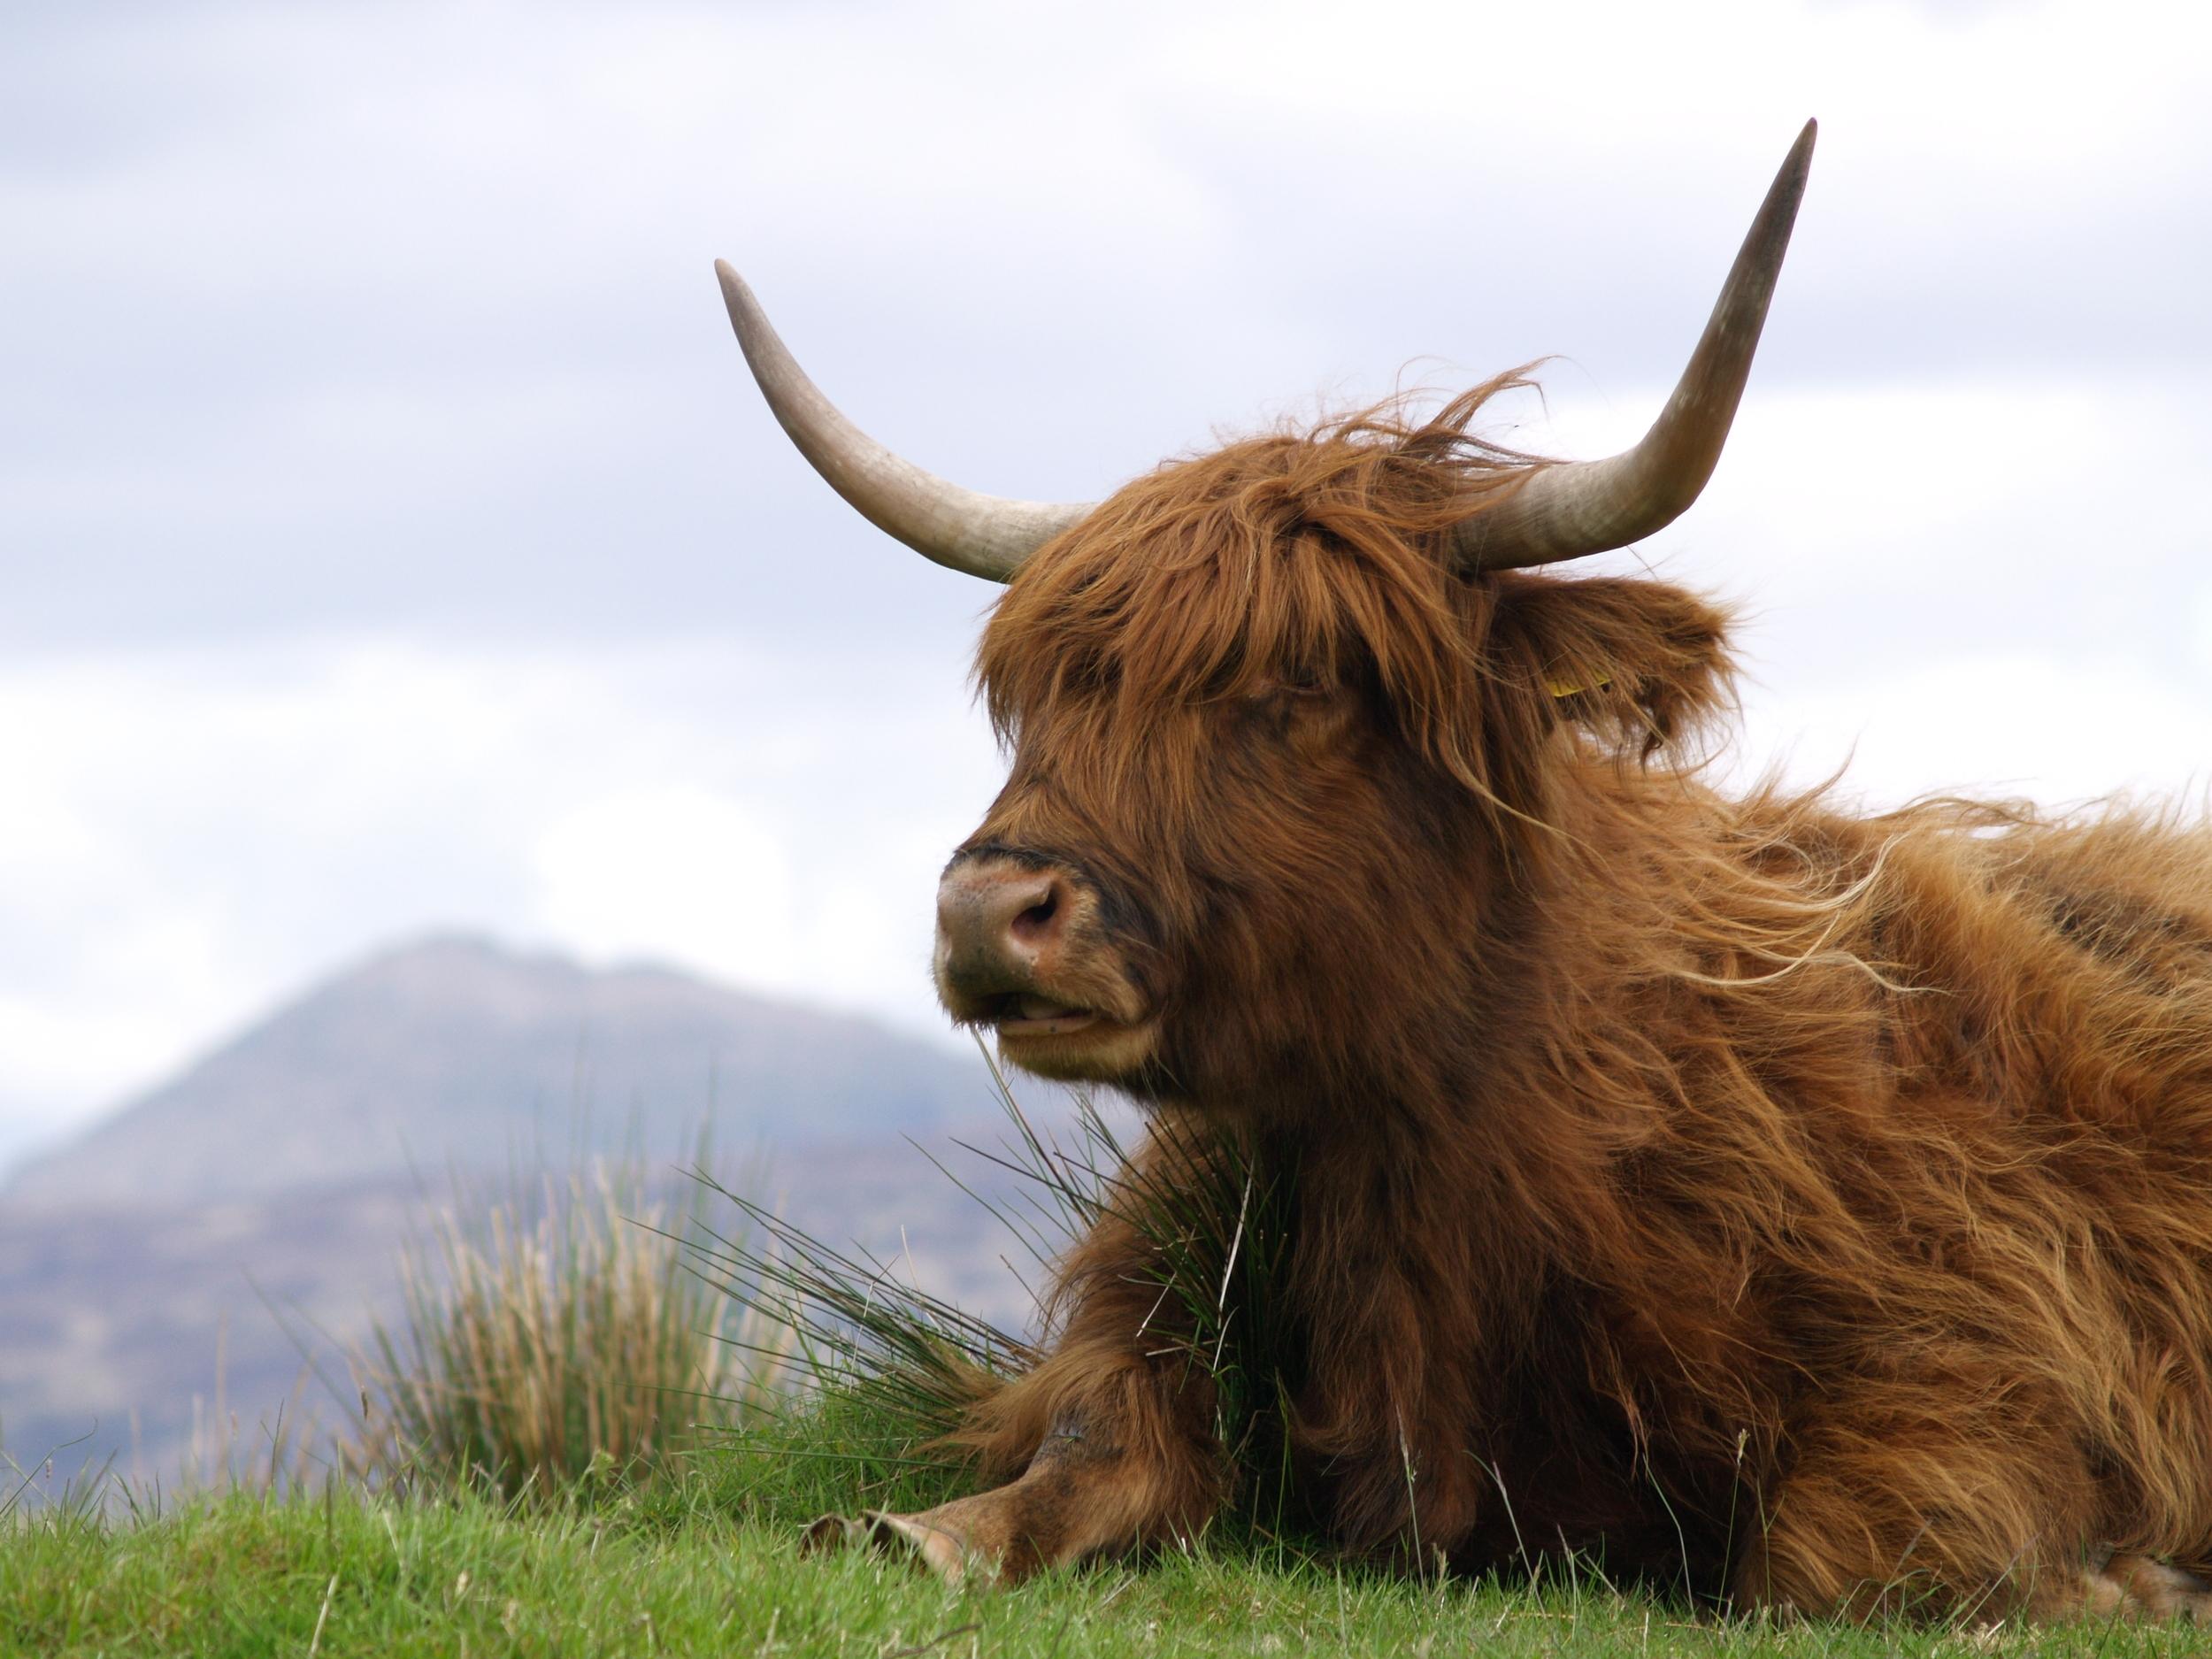 A big Highland Cow enjoying a bit of relaxation next to Loch Arklet (Scottish Gaelic, Loch Aircleid)